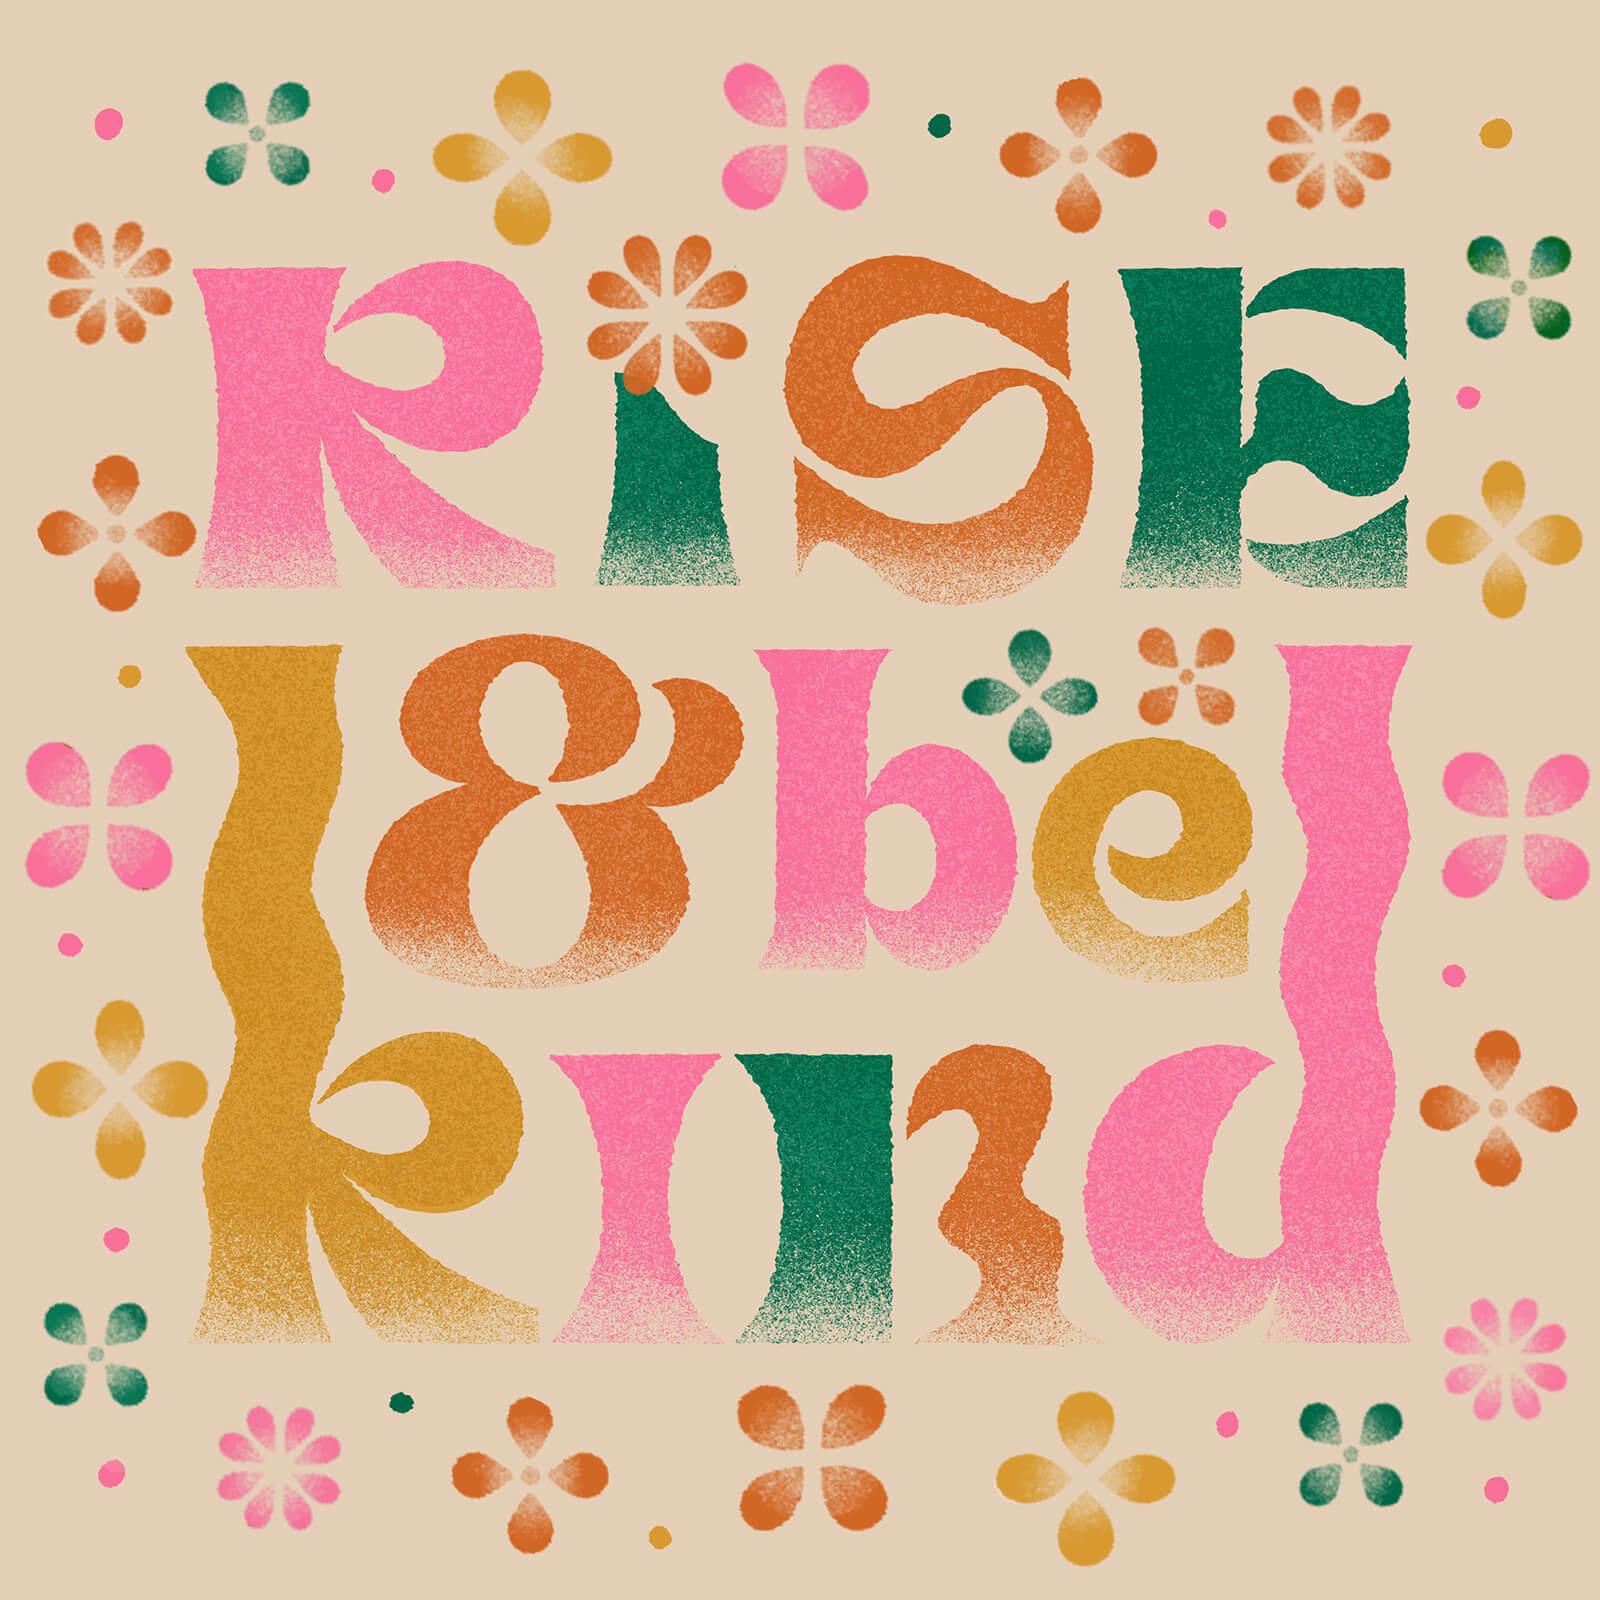 Rise & Be Kind - Jin Kim